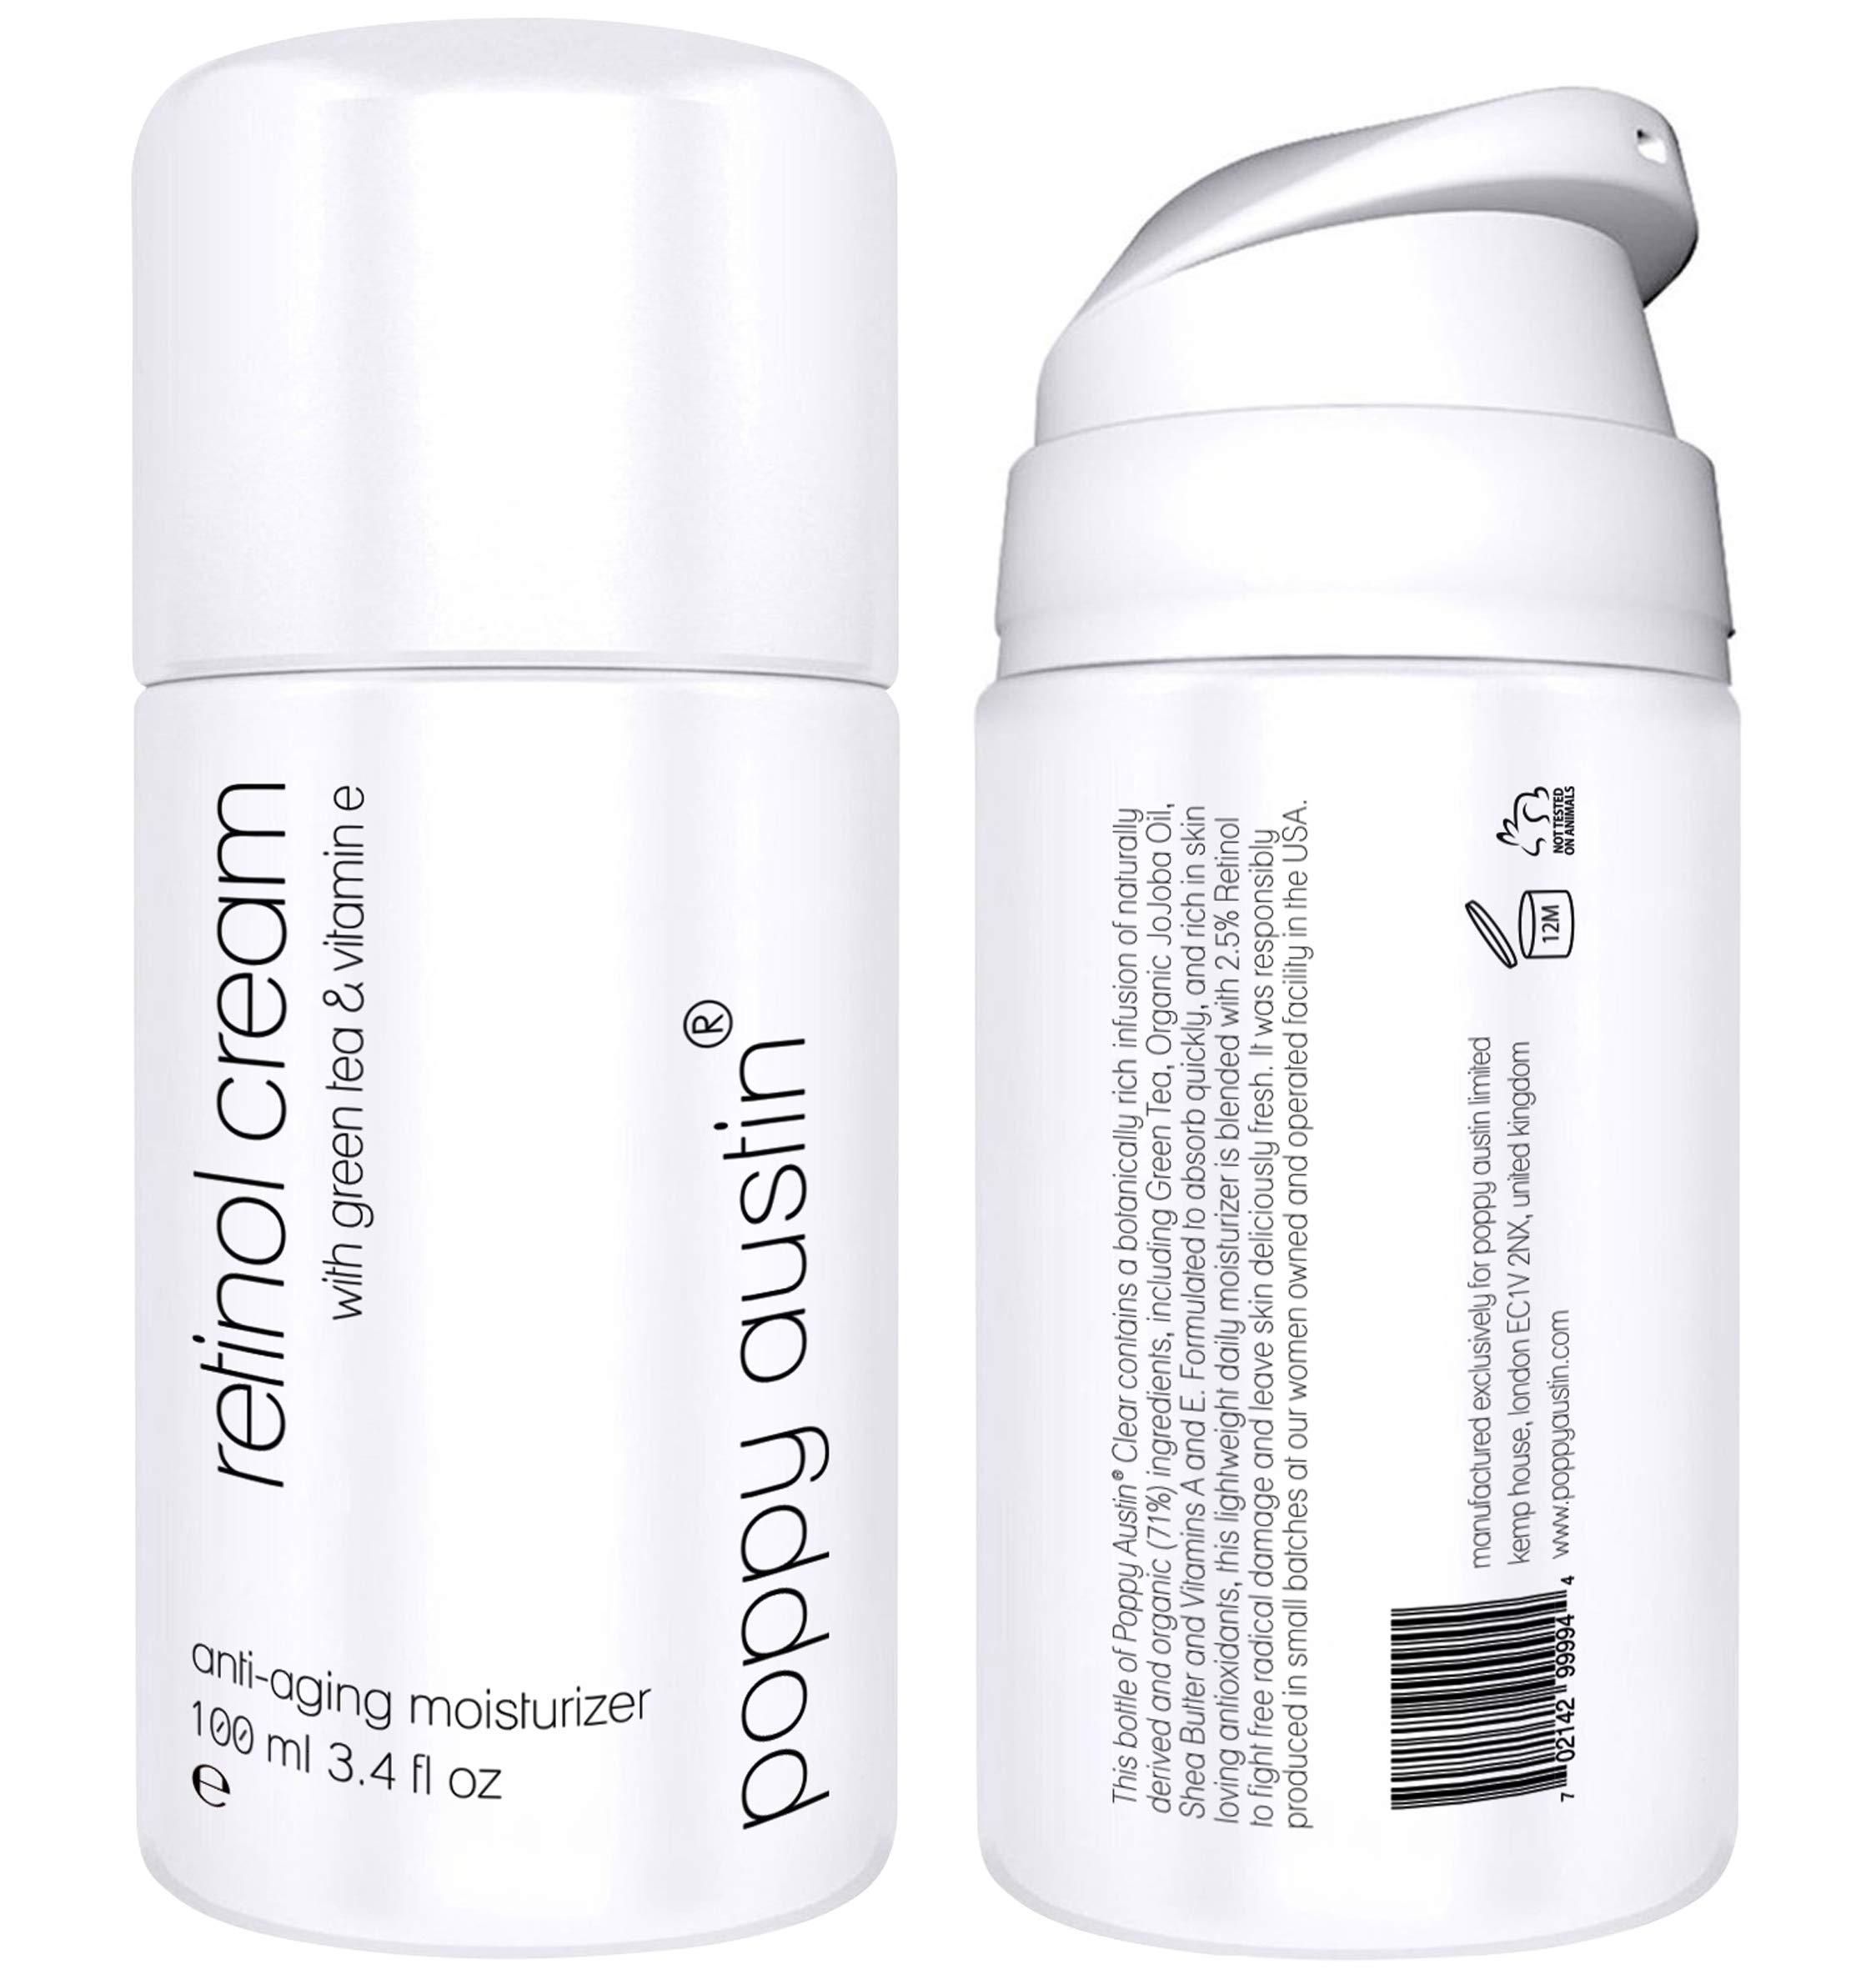 Retinol Cream for Day & Night by Poppy Austin - TRIPLED SIZED 100ml - Cruelty-Free, 2.5% Retinol, Vitamin E, Green Tea & Shea Butter - Anti Ageing Face Moisturiser & 2019 Best Wrinkle Cream